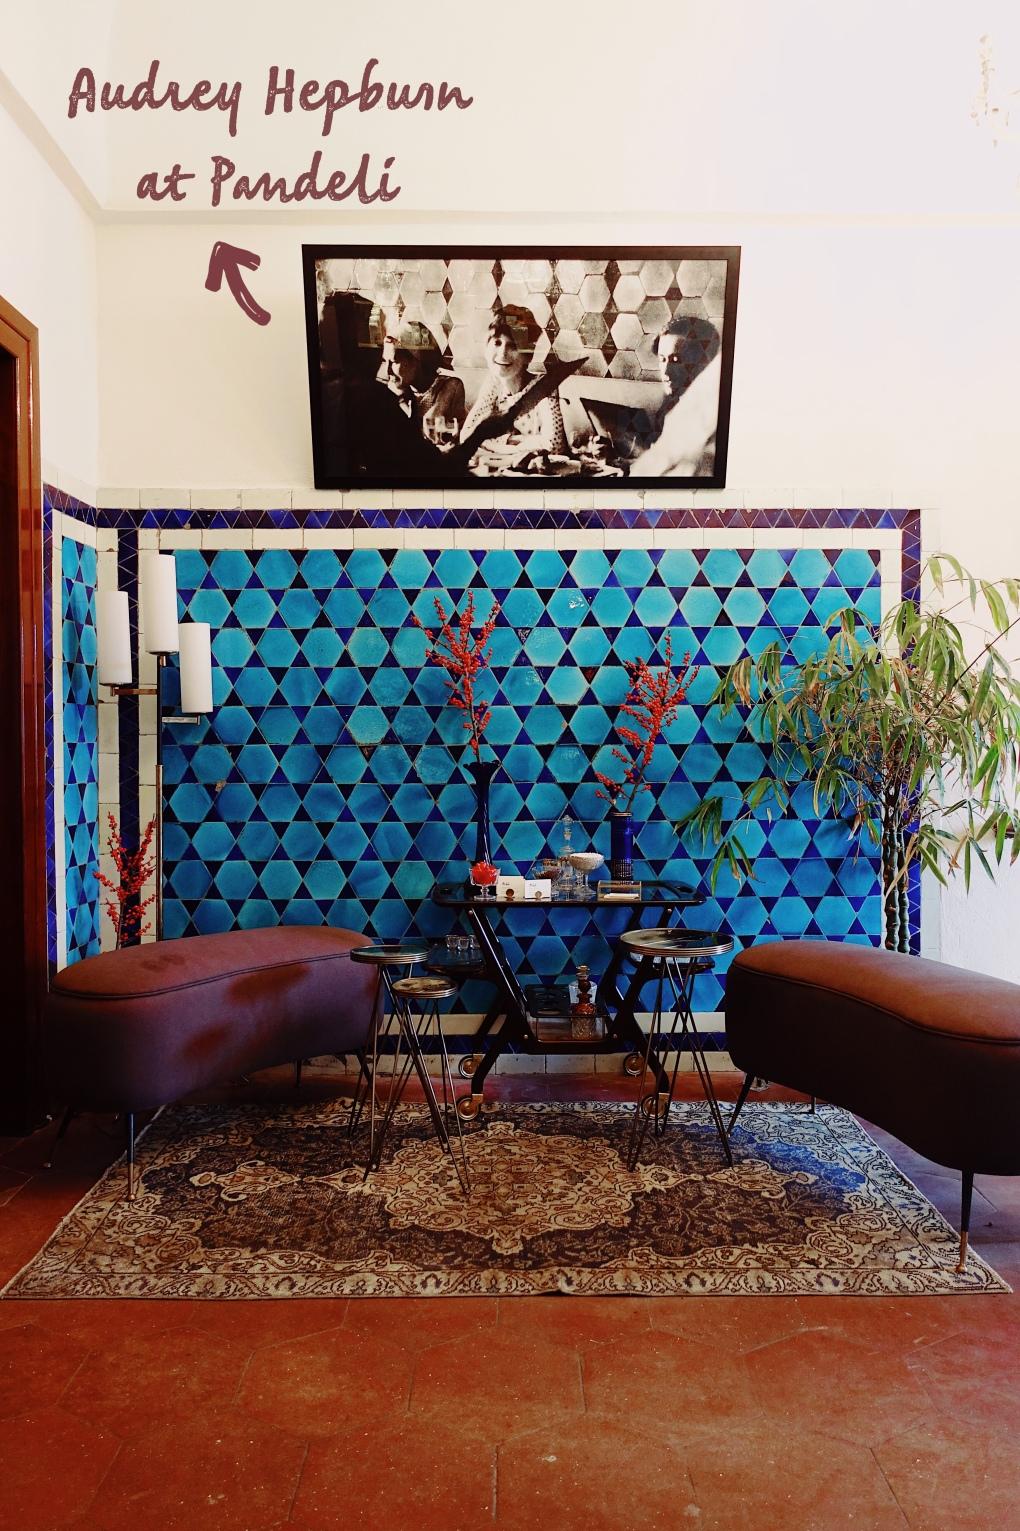 goodcityguides istanbul pandeli restaurant audrey hepburn